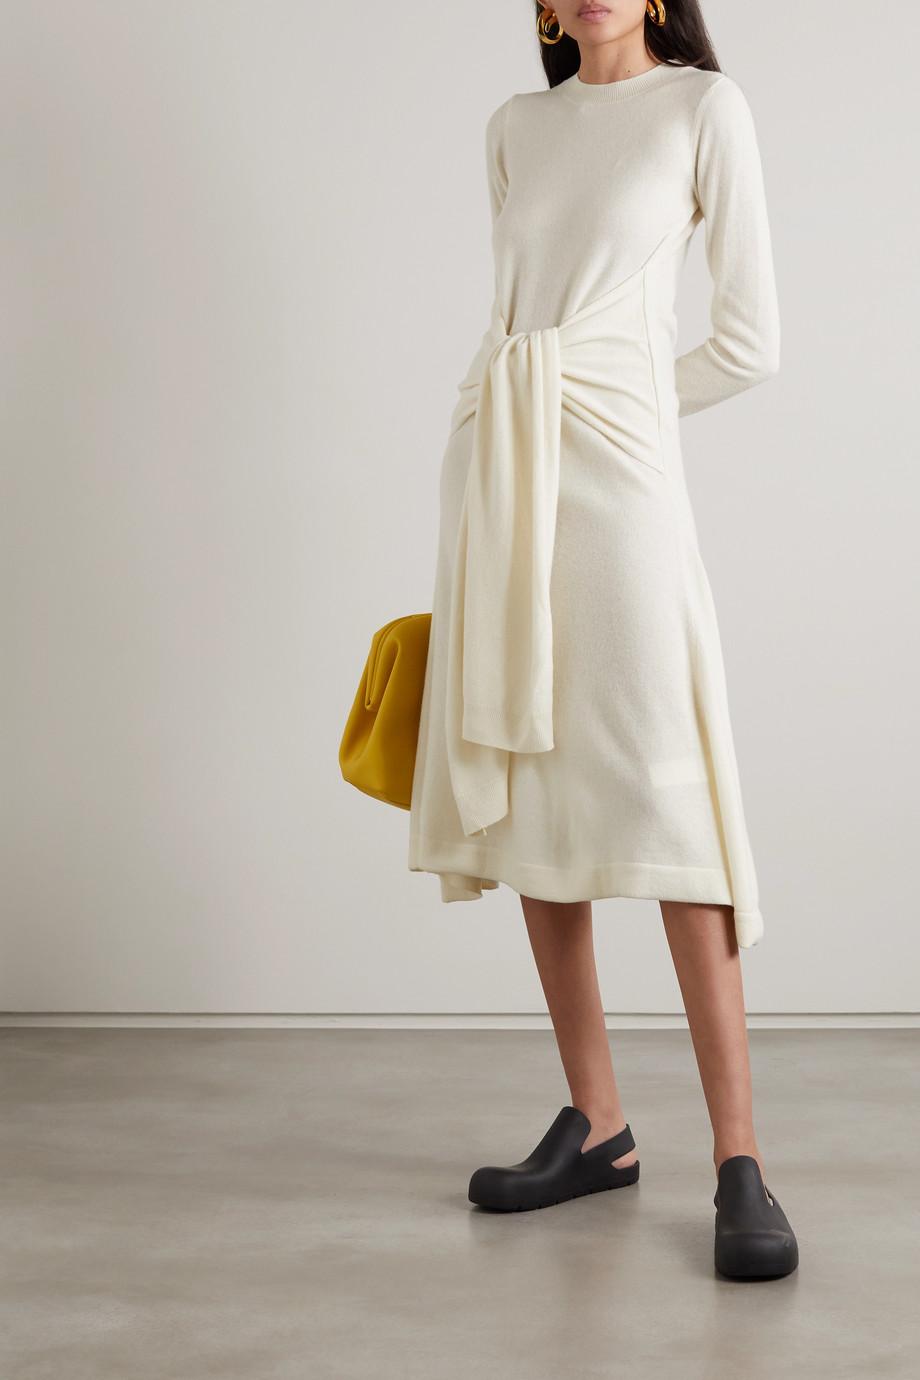 JW Anderson Tie-front wool midi dress